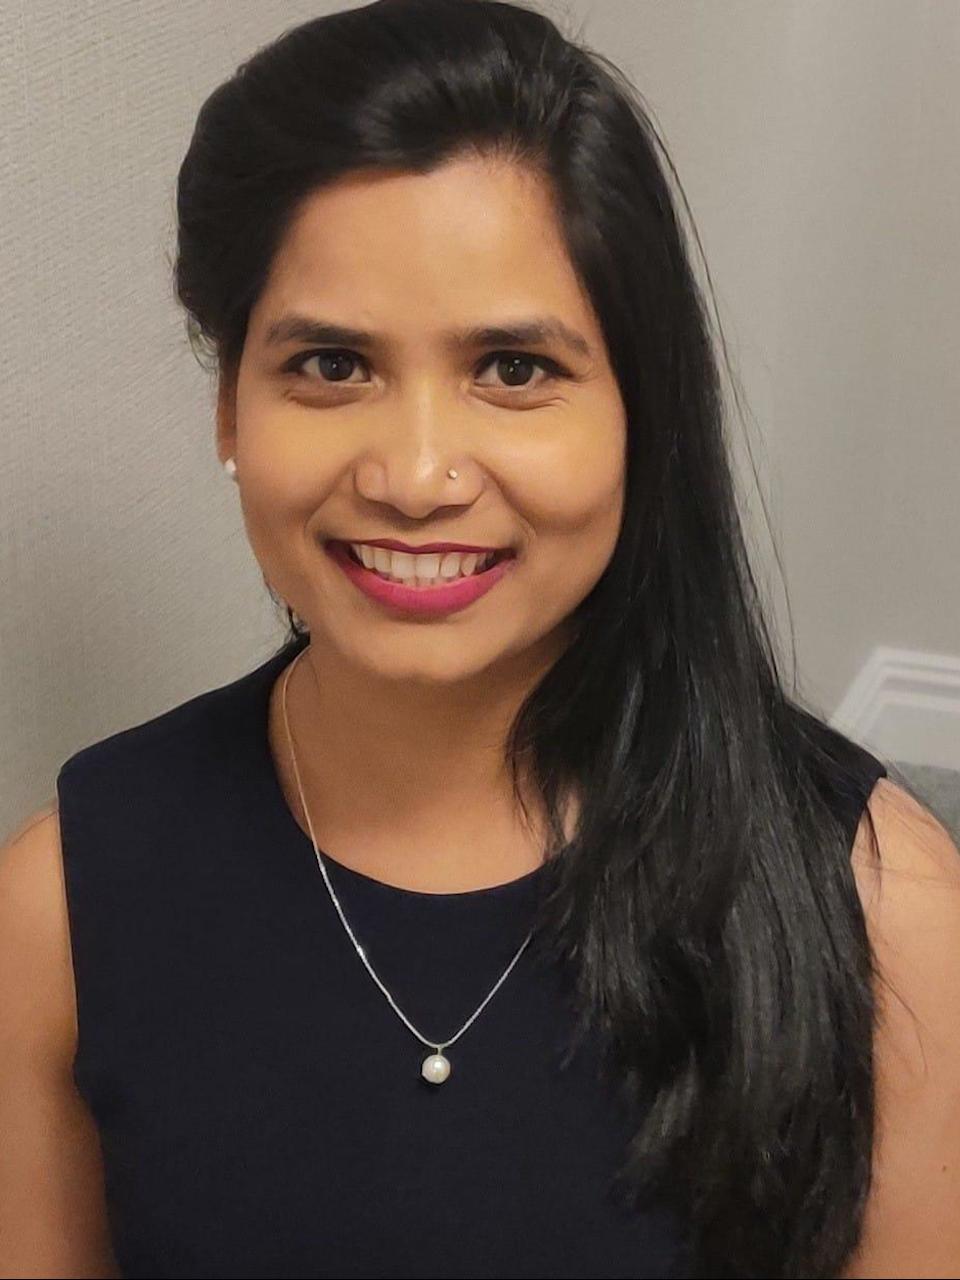 Ananya Gupta headshot